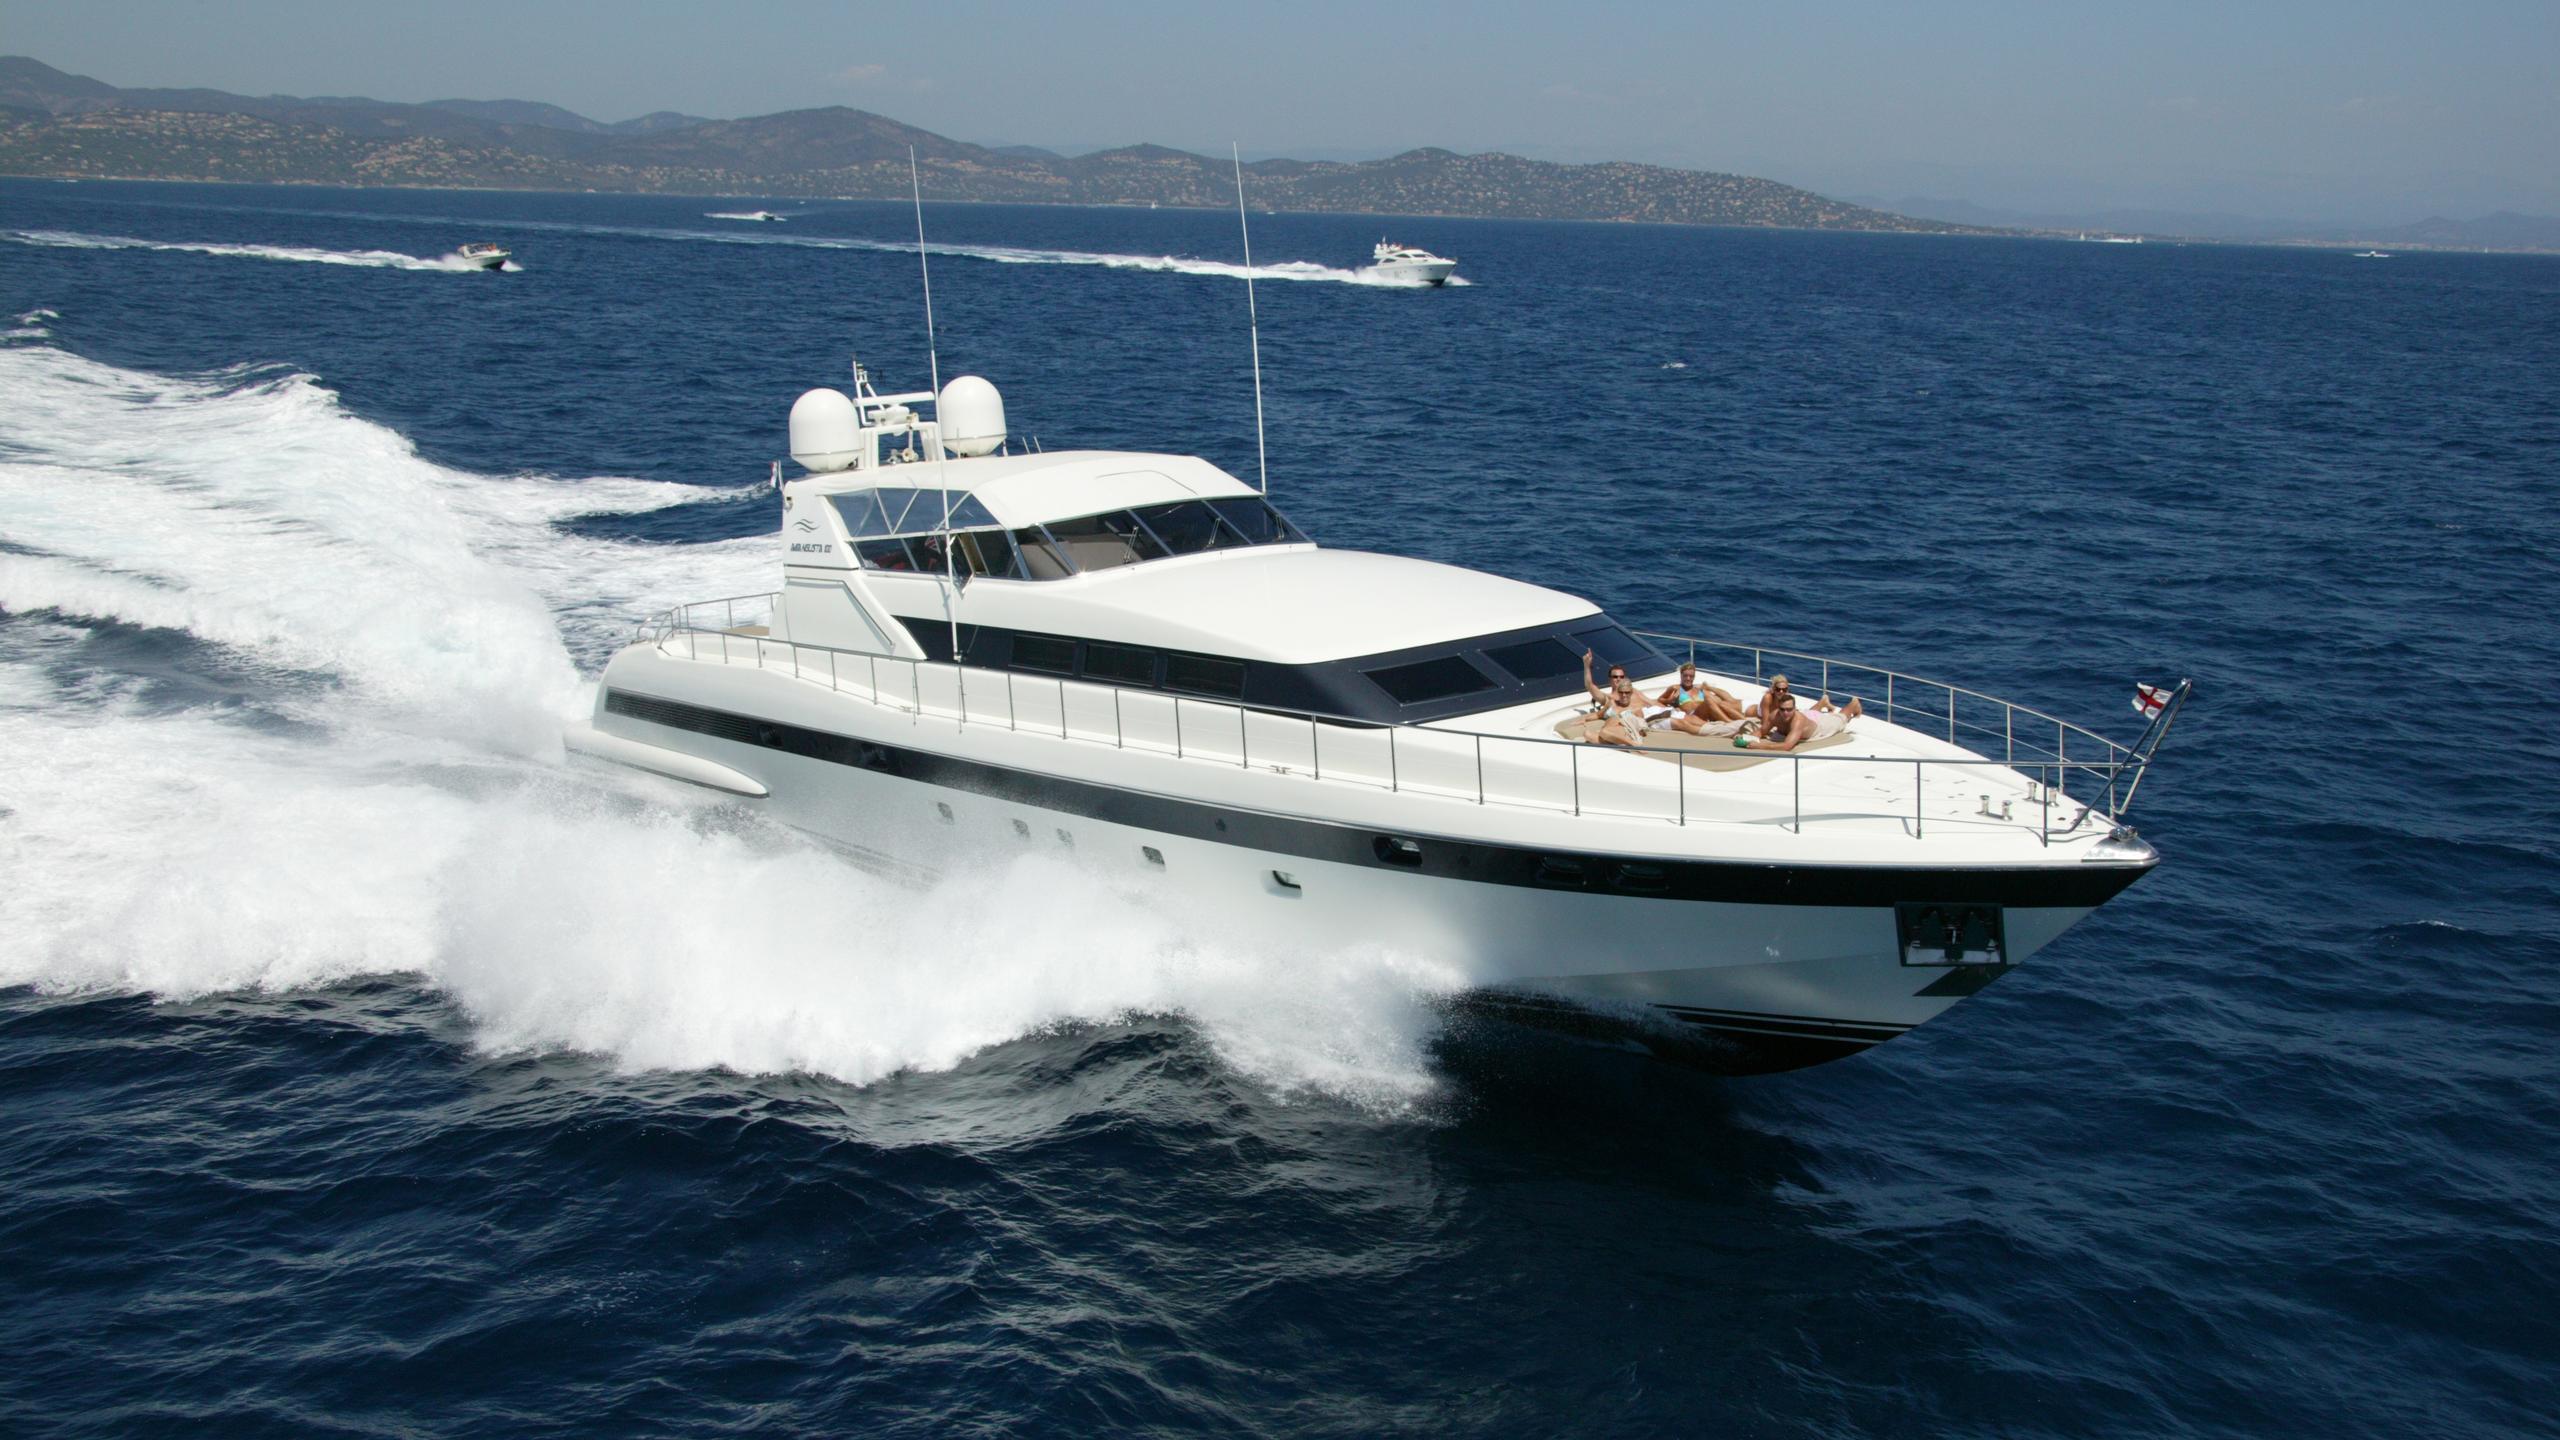 equilibrium motoryacht overmarine mangusta 100 1996 30m running half profile